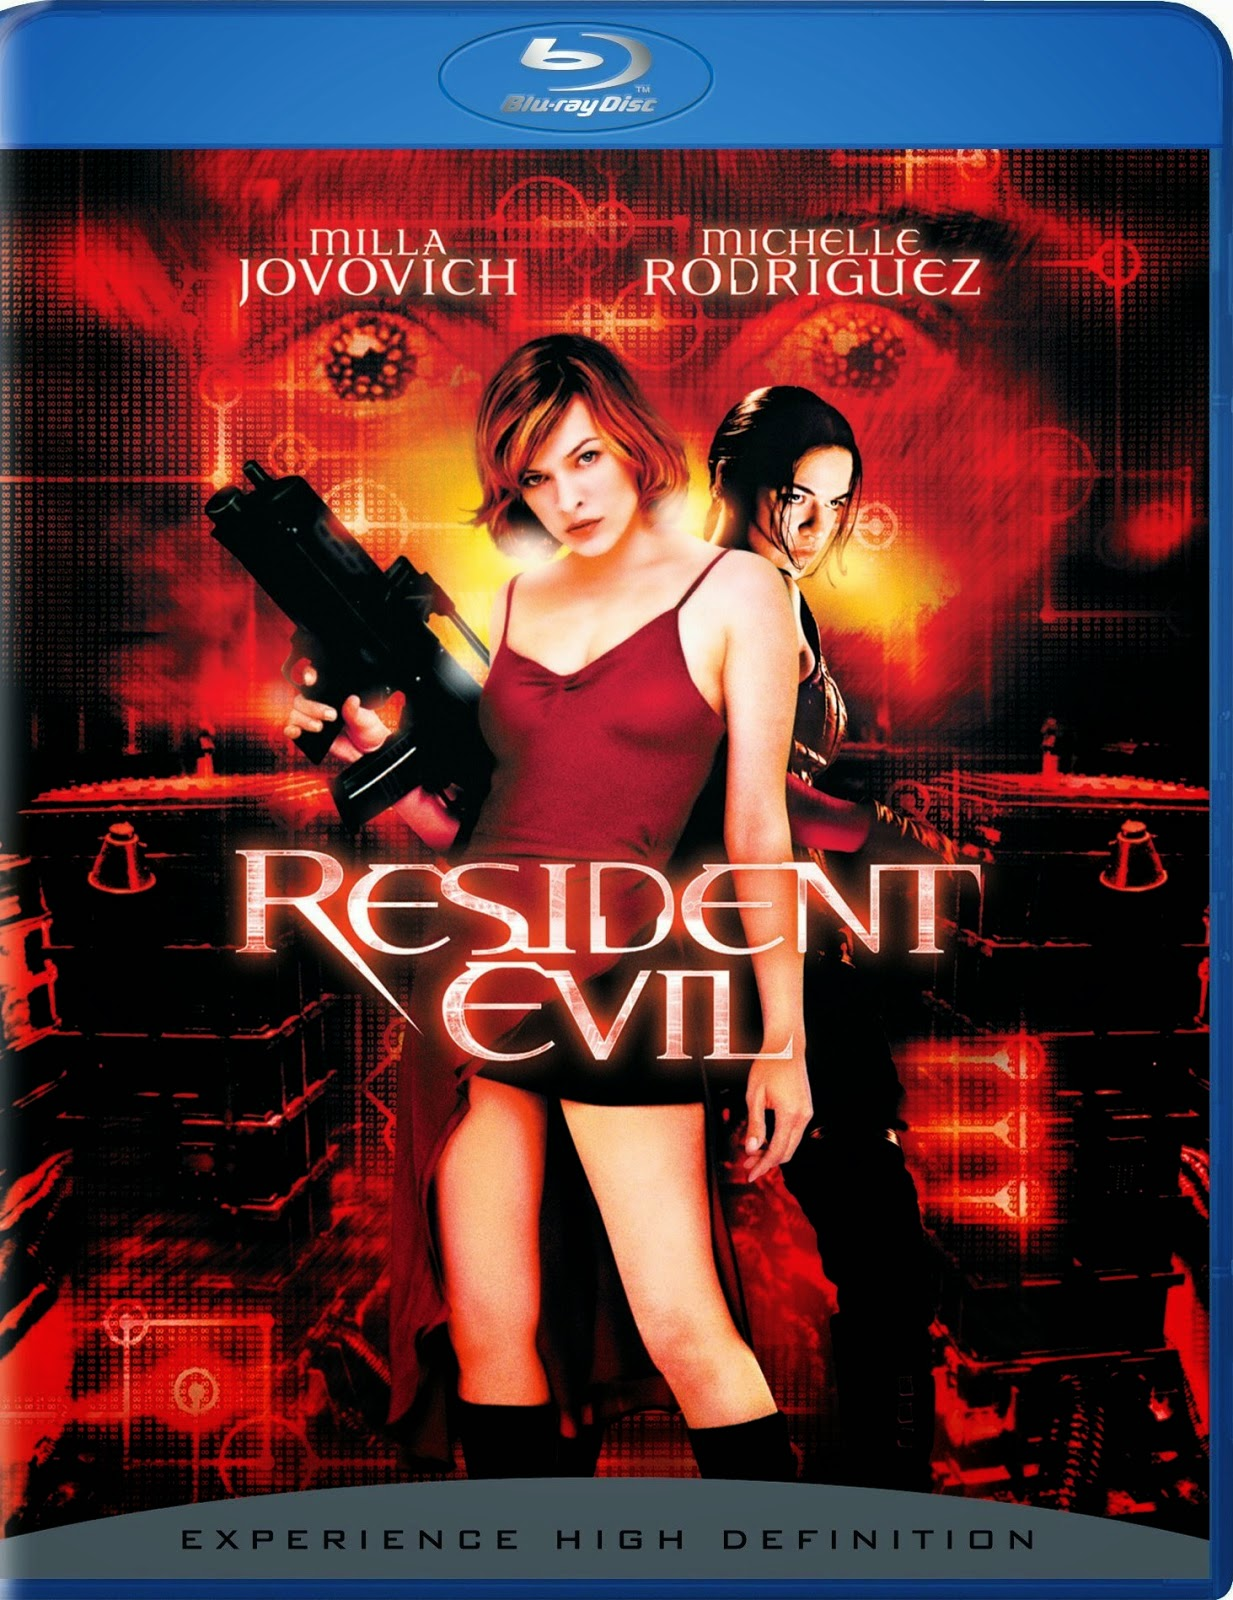 Resident Evil (2002)  เรสซิเดนท์ อีวิล ผีชีวะ